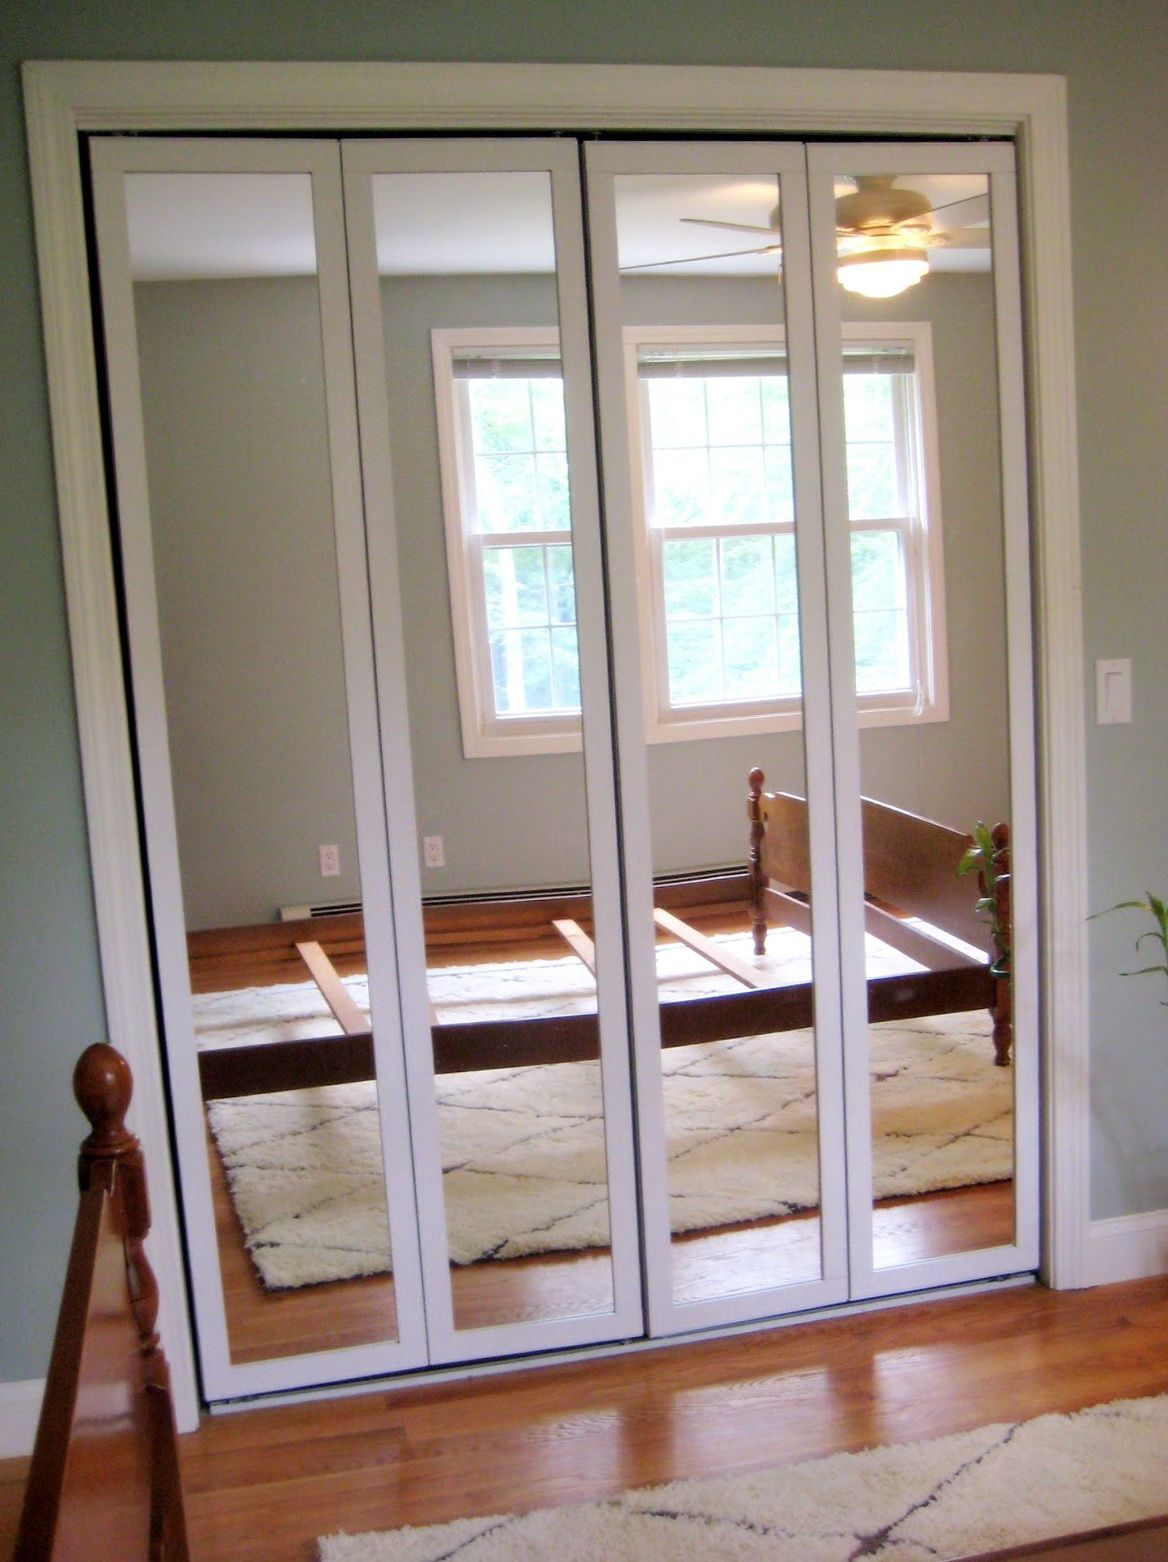 Mirrored Folding Closet Doors. Do you think Mirrored